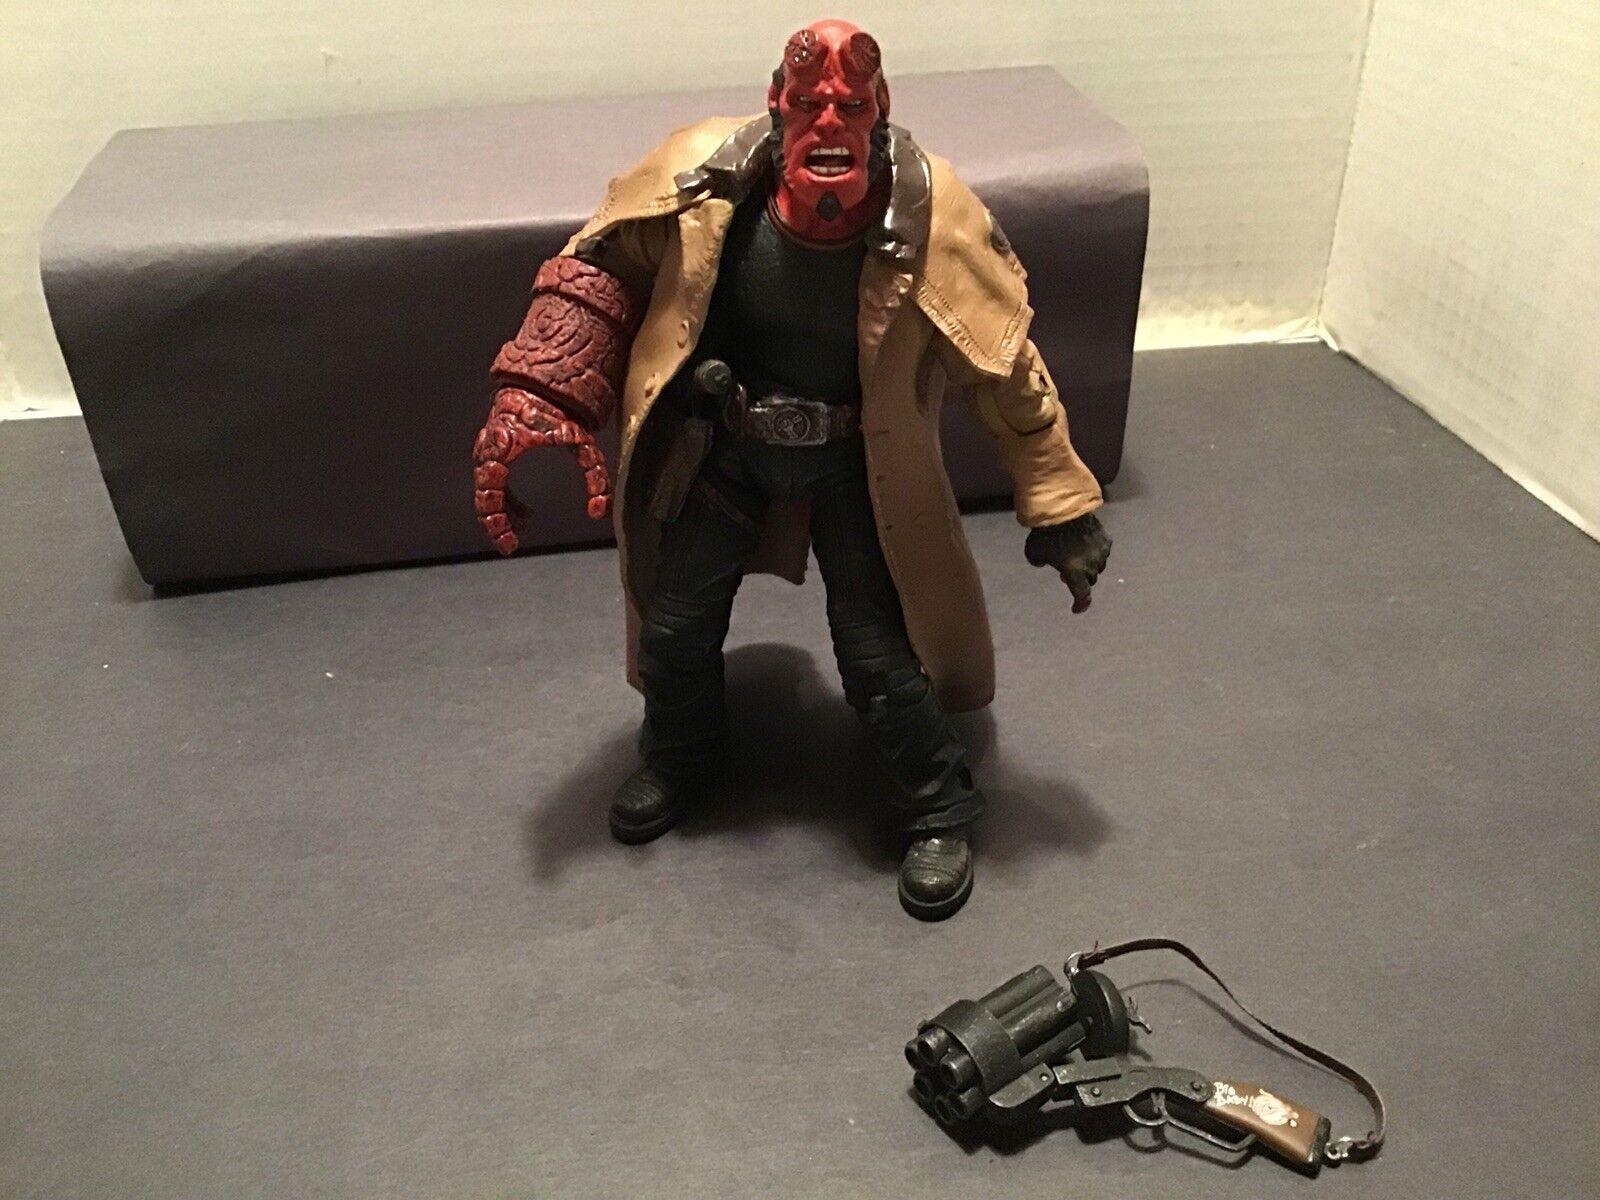 MEZCO HELLBOY II The oren Army-Hellboy  avec Big    la qualité d'abord les consommateurs d'abord